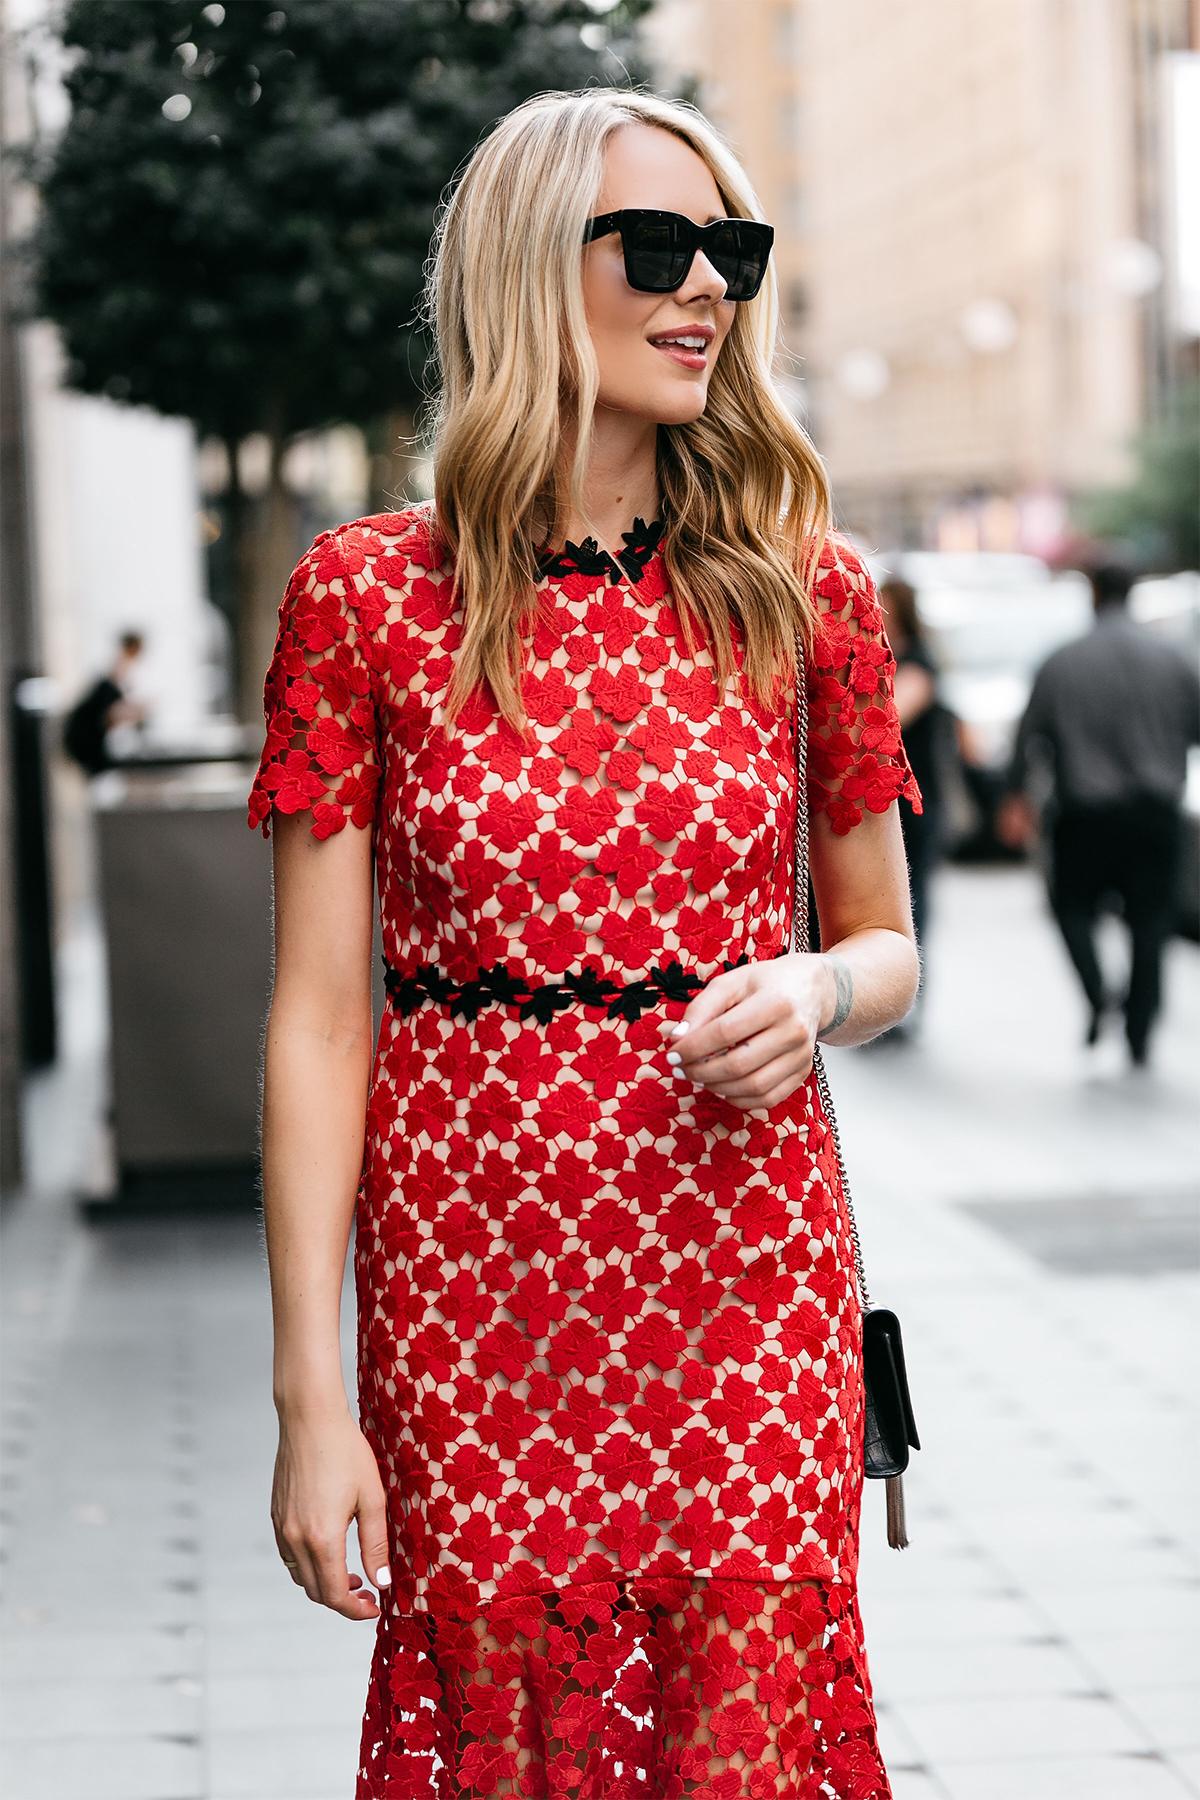 Fashion Jackson, Dallas Blogger, Fashion Blogger, Street Style, Jill Stuart Floral Red Lace Dress